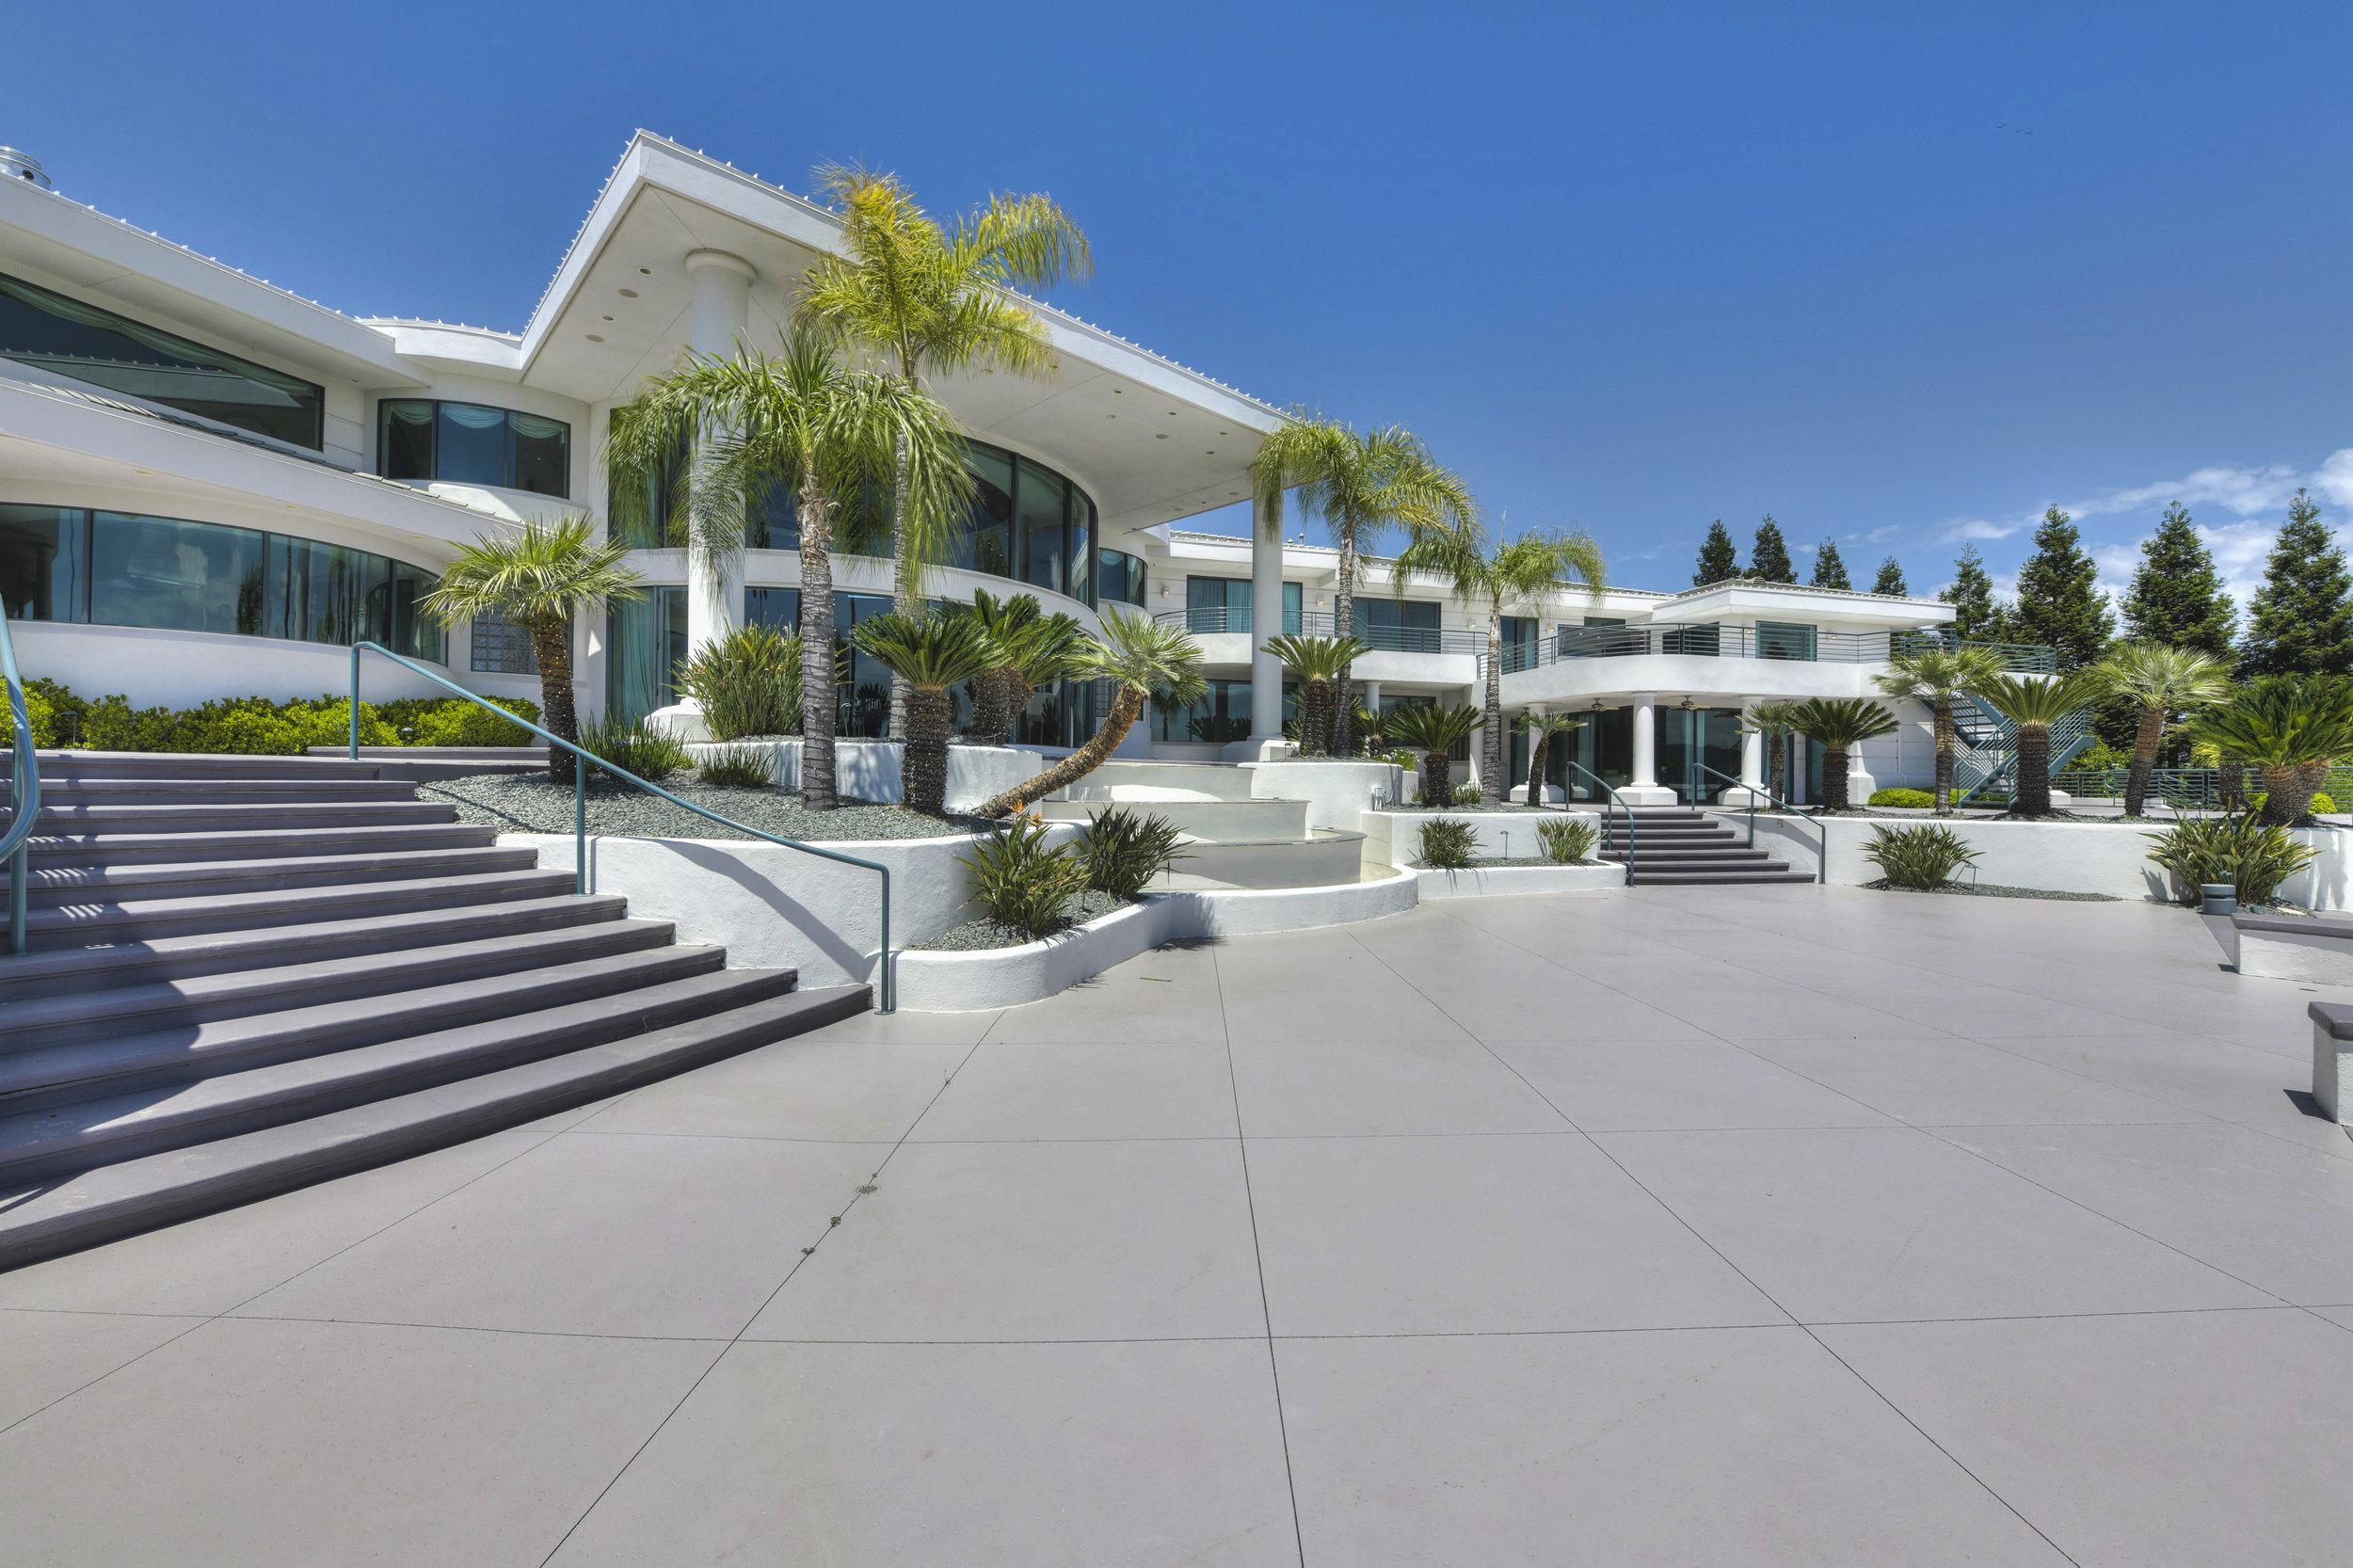 9125 Vista De Lago Court 7.jpg